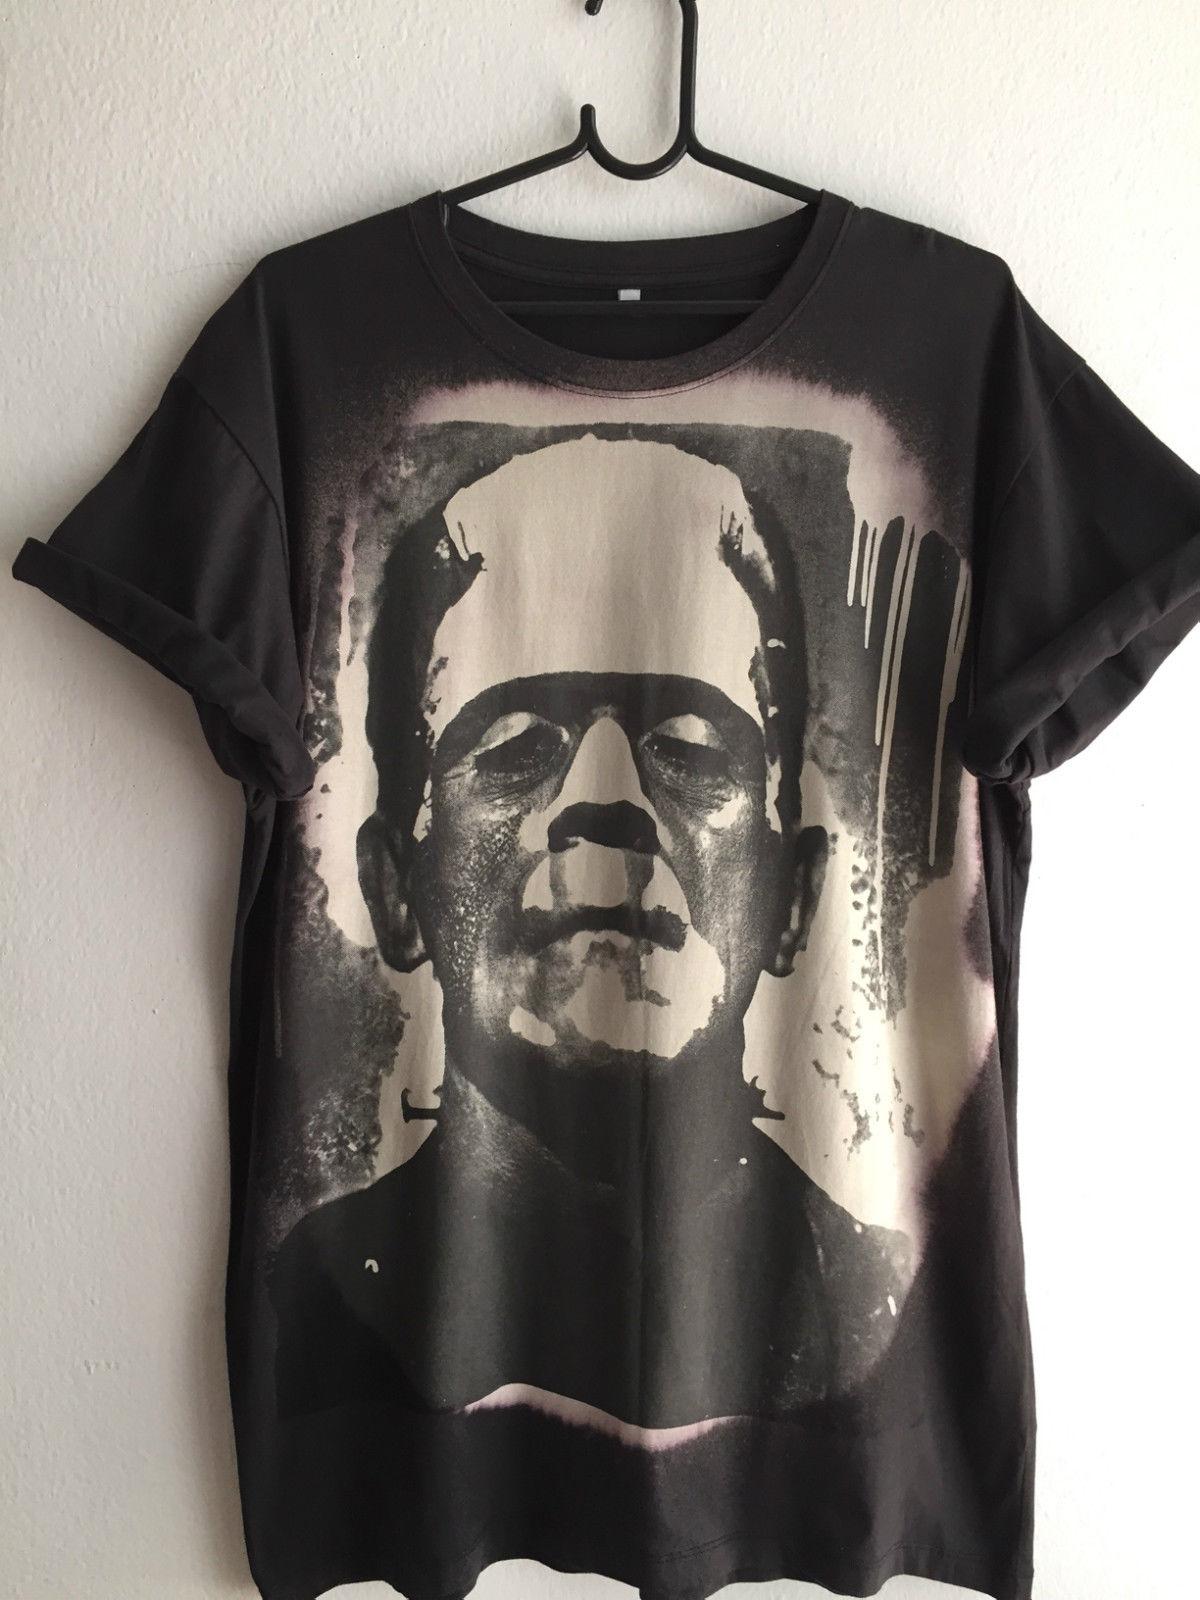 frankenstein_classic_monster_pop_rock_fashion_t_shirt_xl_shirts_3.JPG